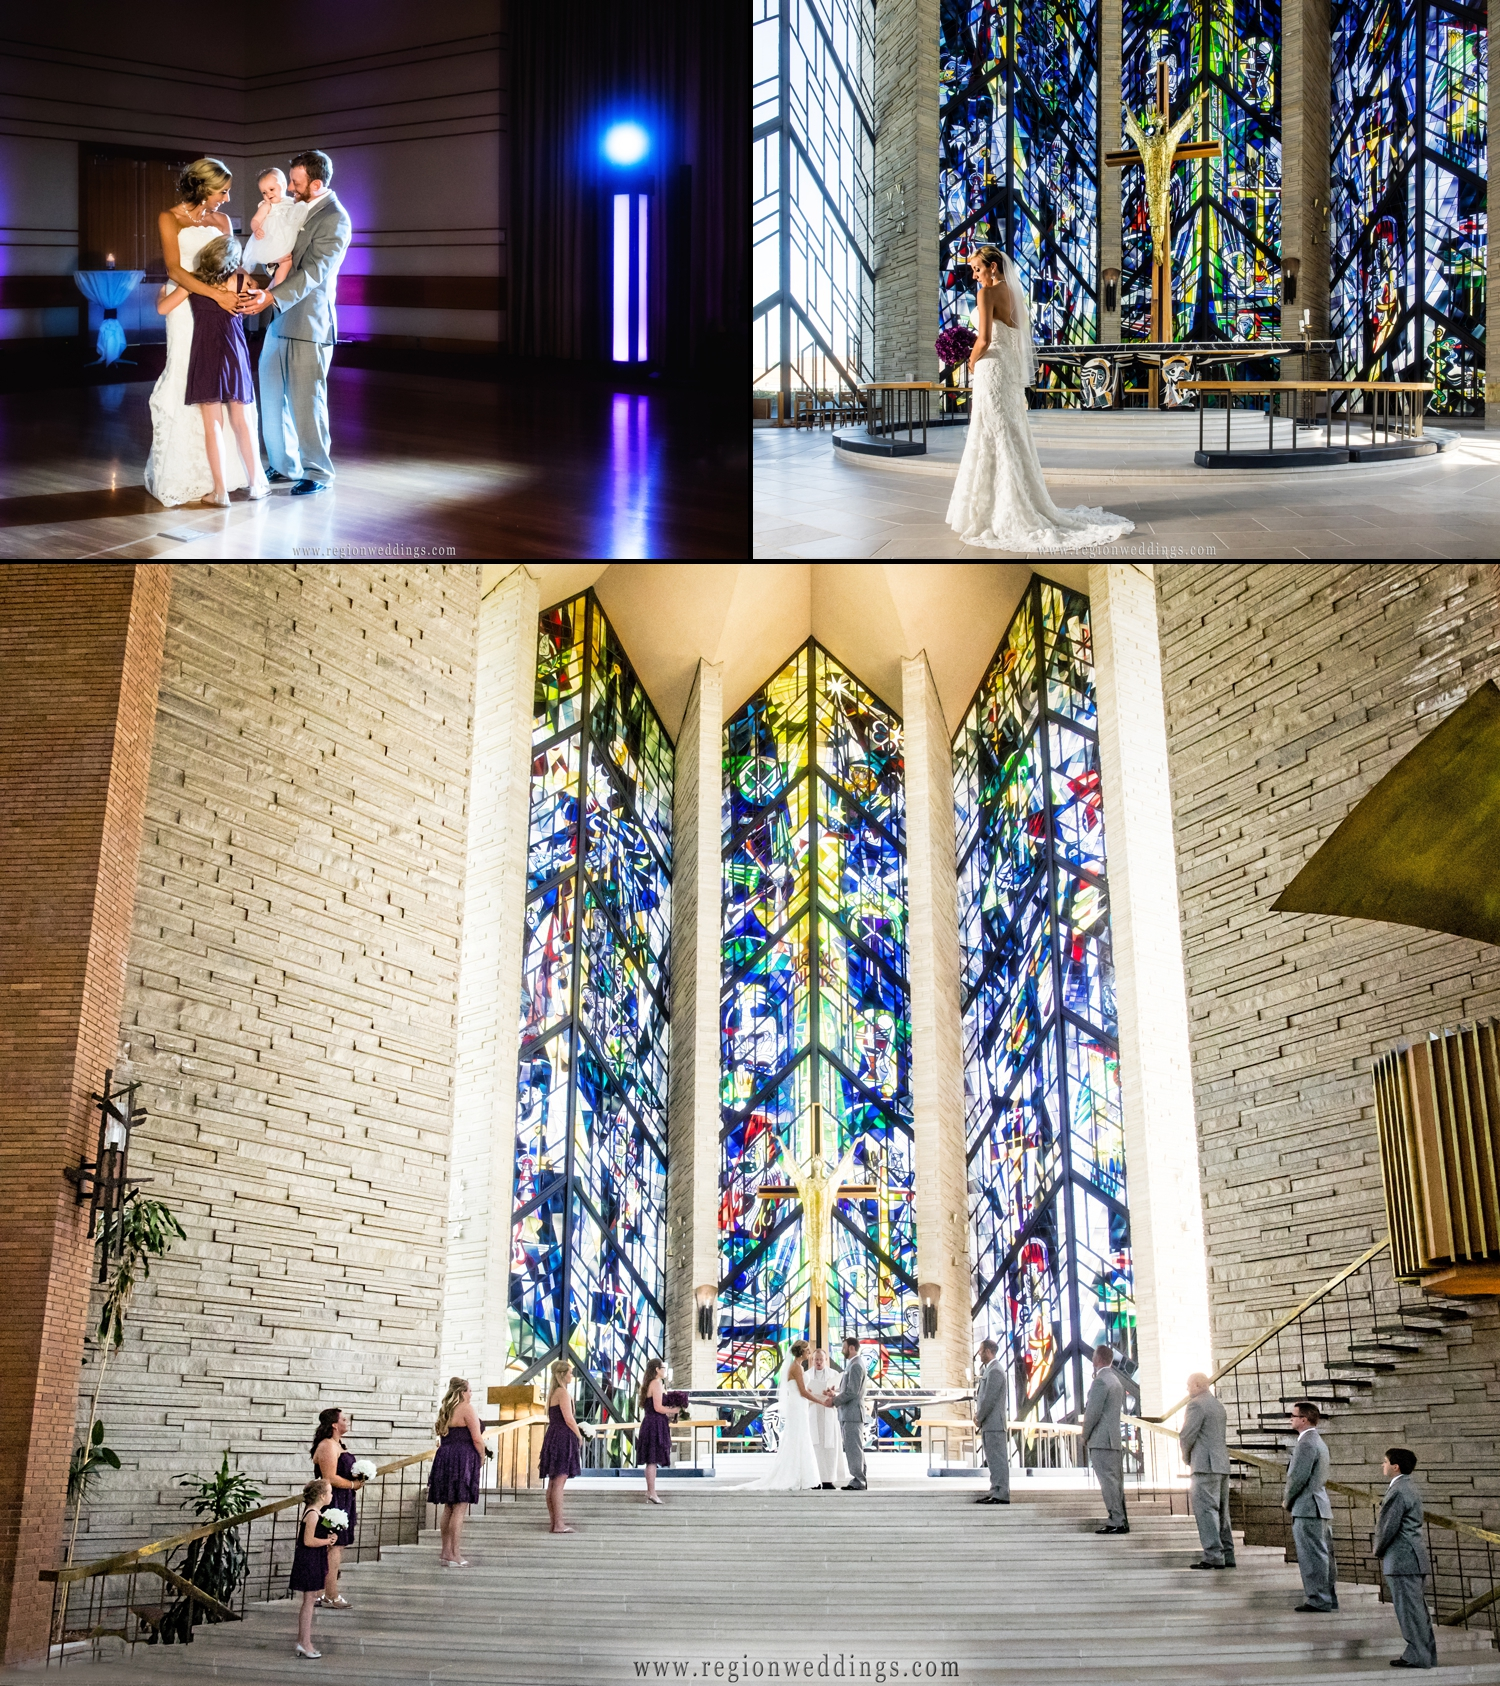 valparaiso-university-wedding-venue-collage.jpg